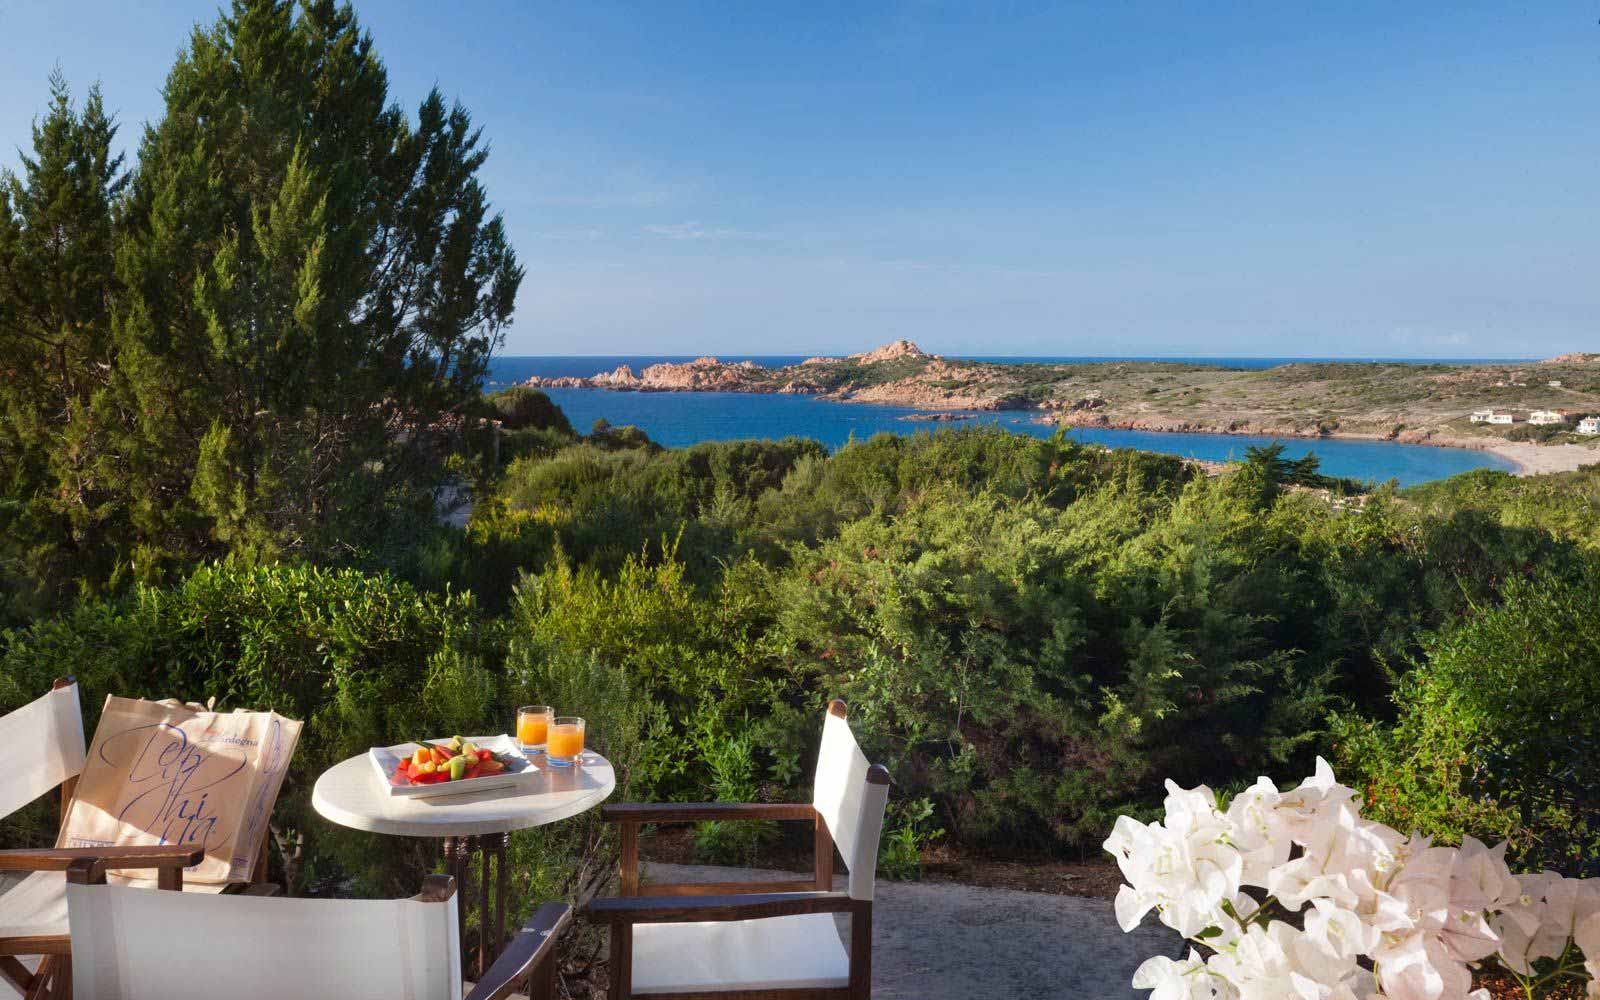 Relax veranda at Hotel Marinedda Thalasso & Spa